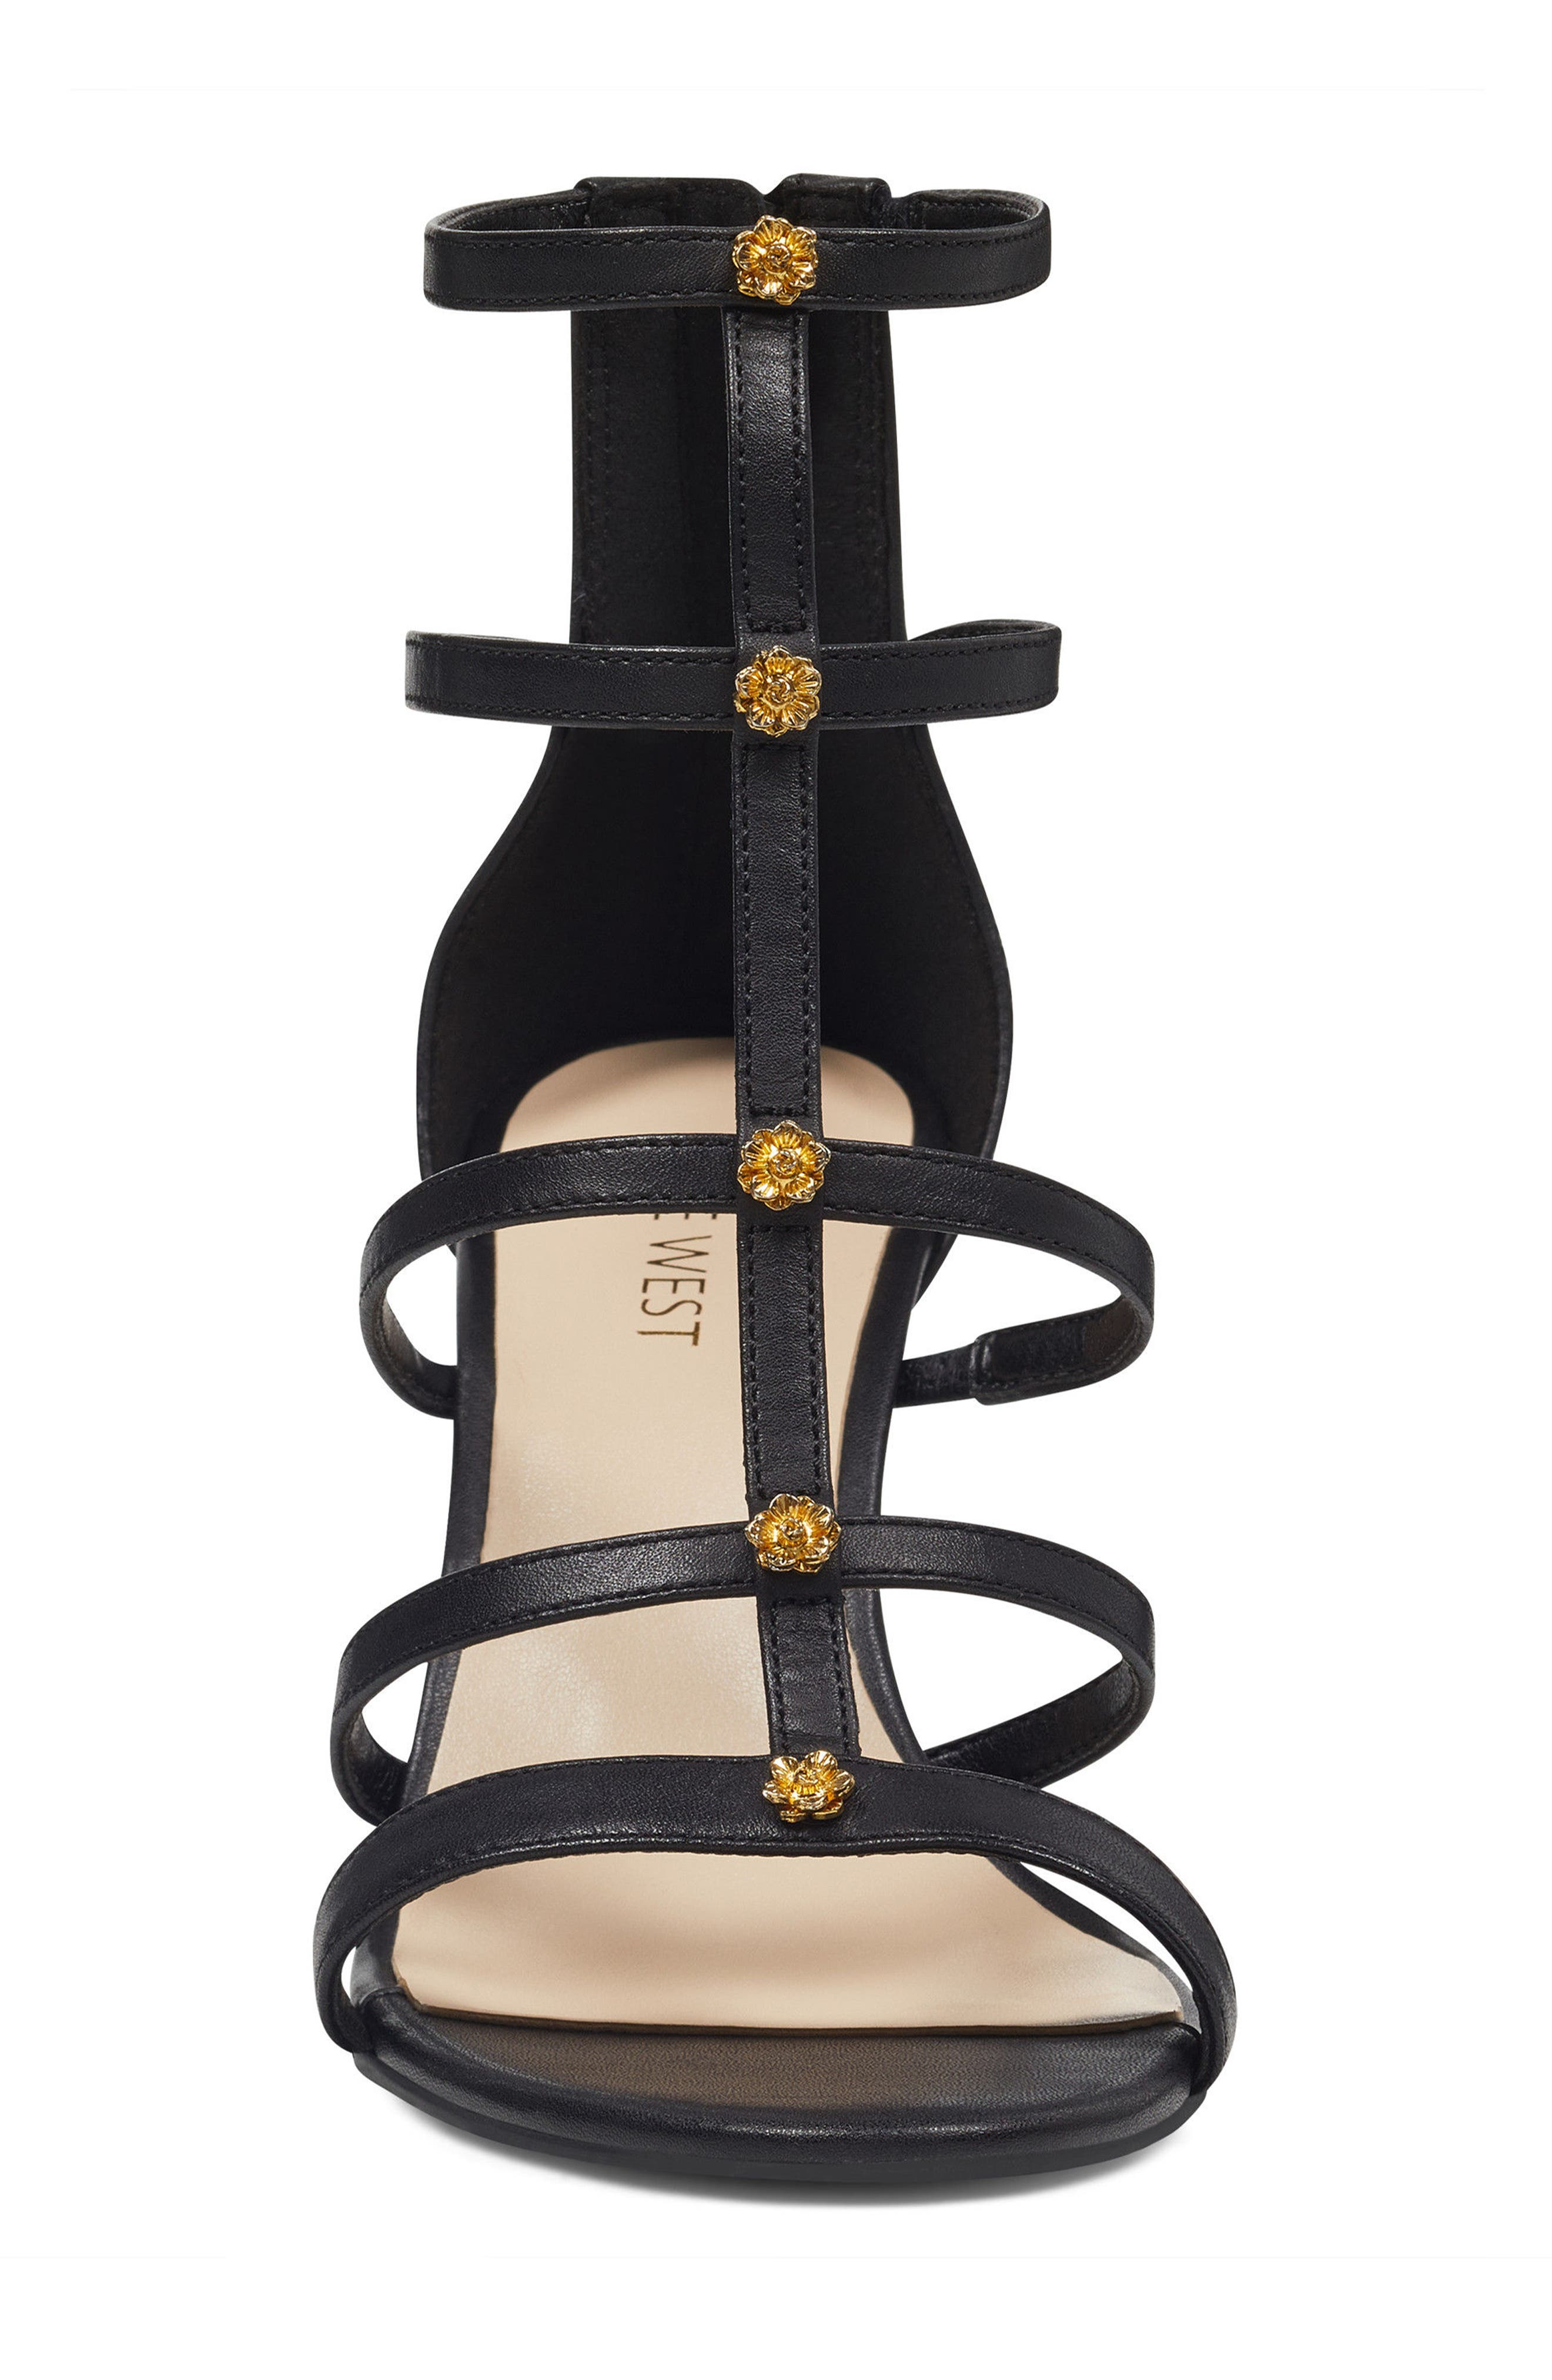 Nayler Strappy Sandal,                             Alternate thumbnail 4, color,                             Black Leather